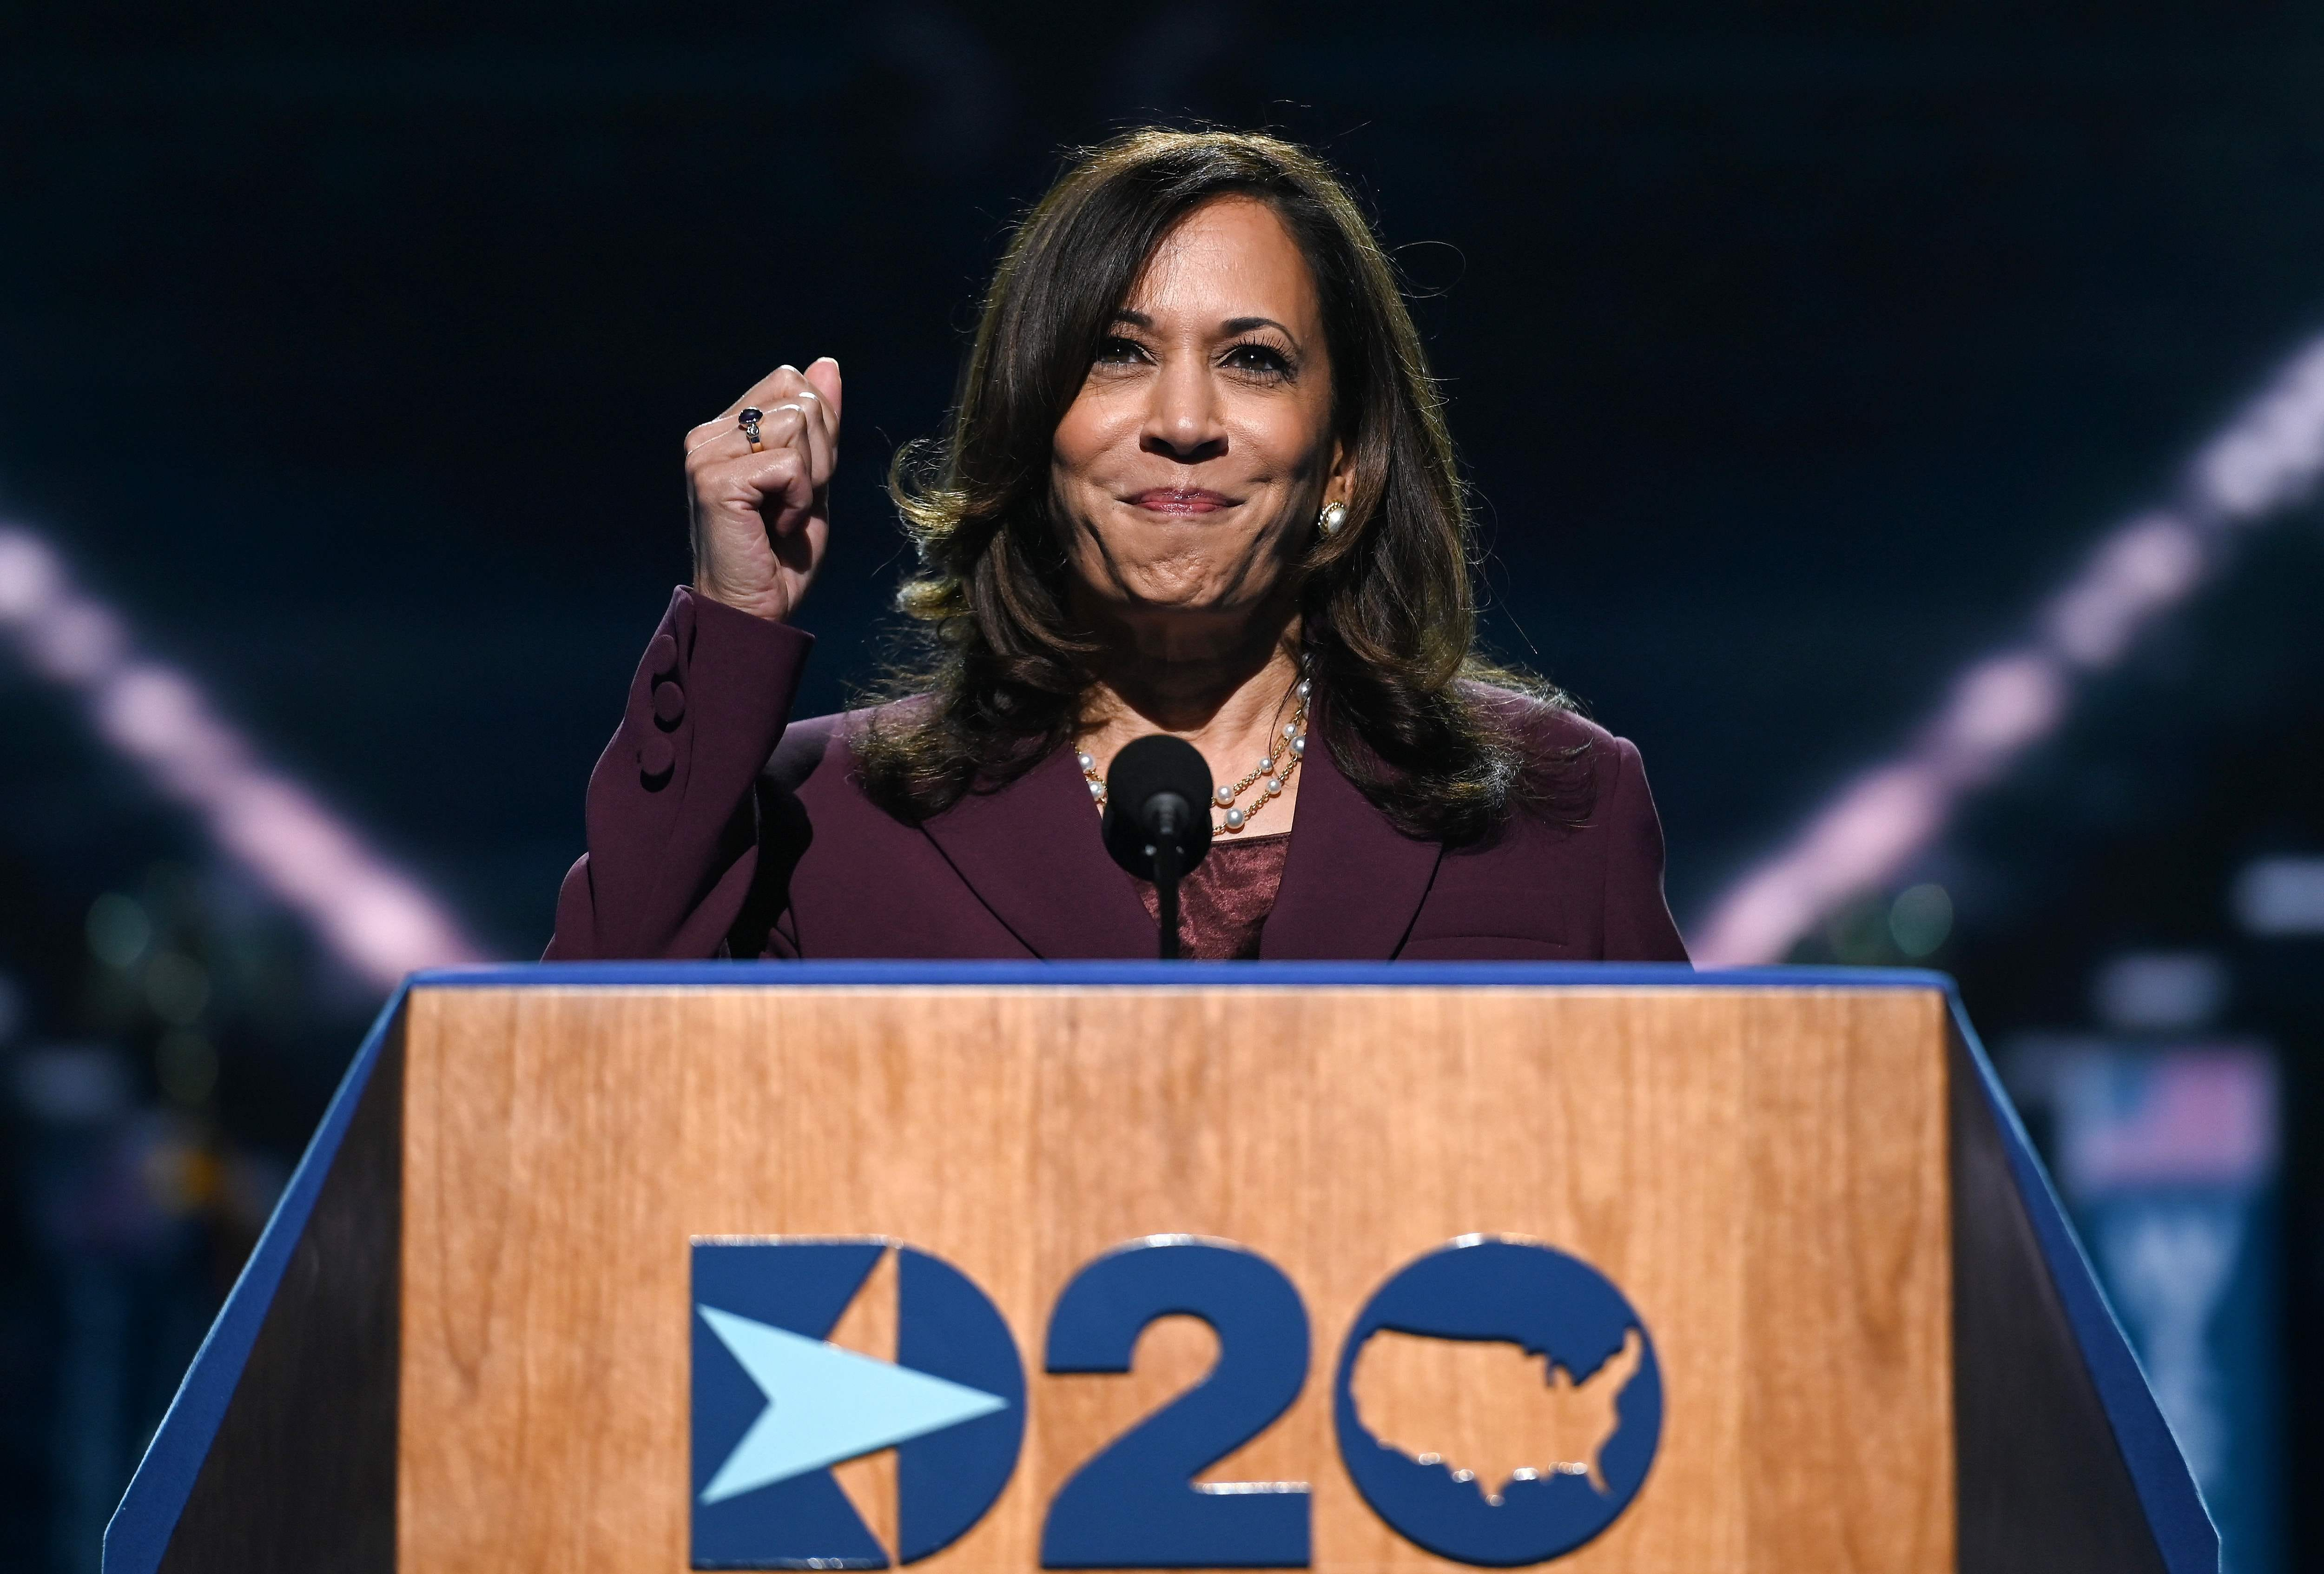 Kamala Harris Makes History In Dnc Vice Presidential Acceptance Speech